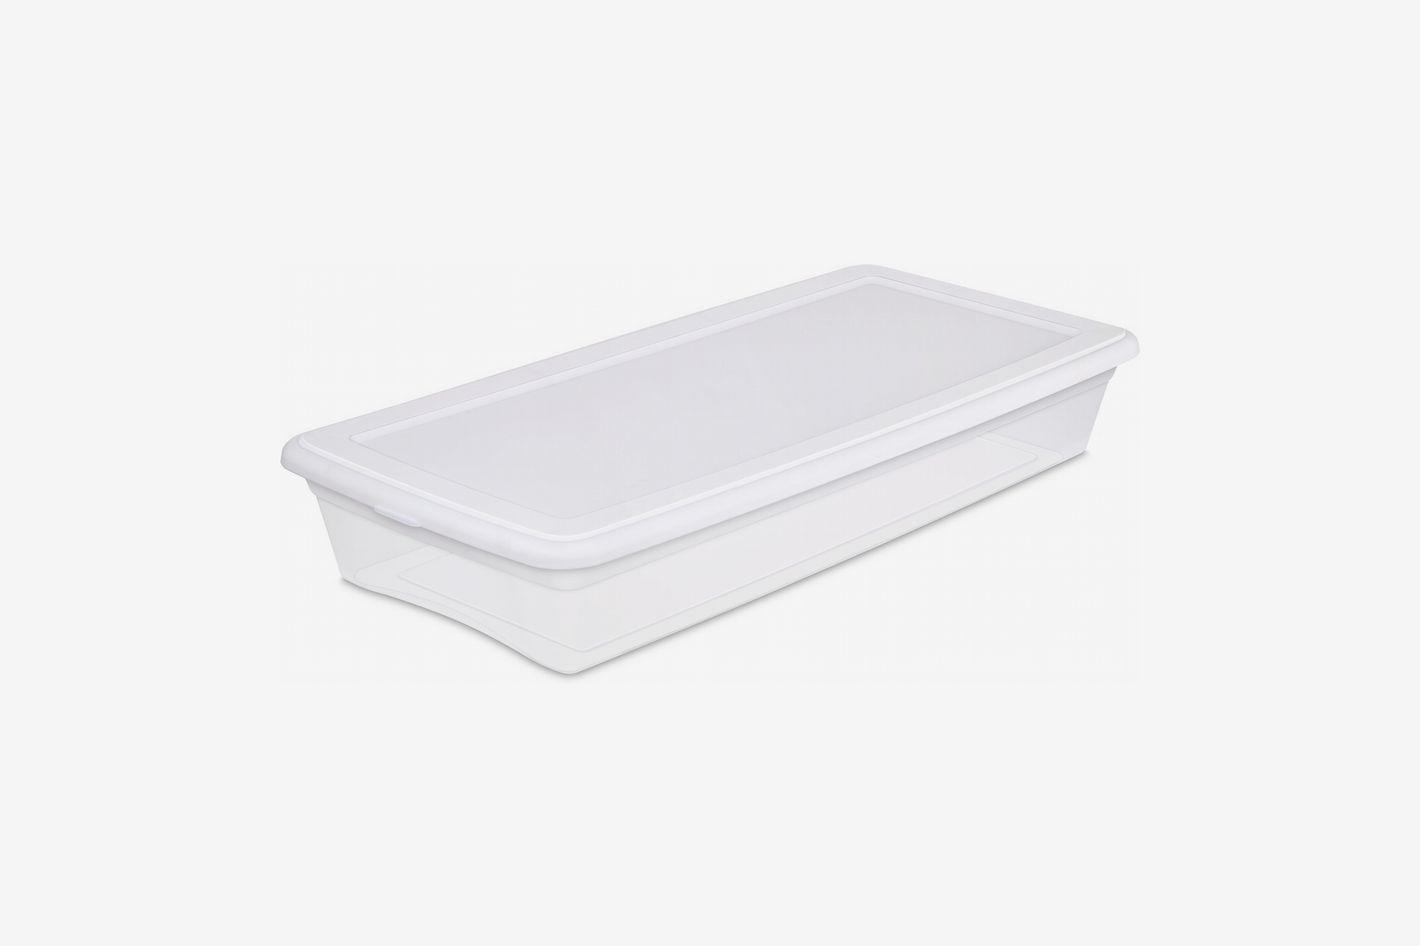 Sterilite 41qt Under-Bed Box